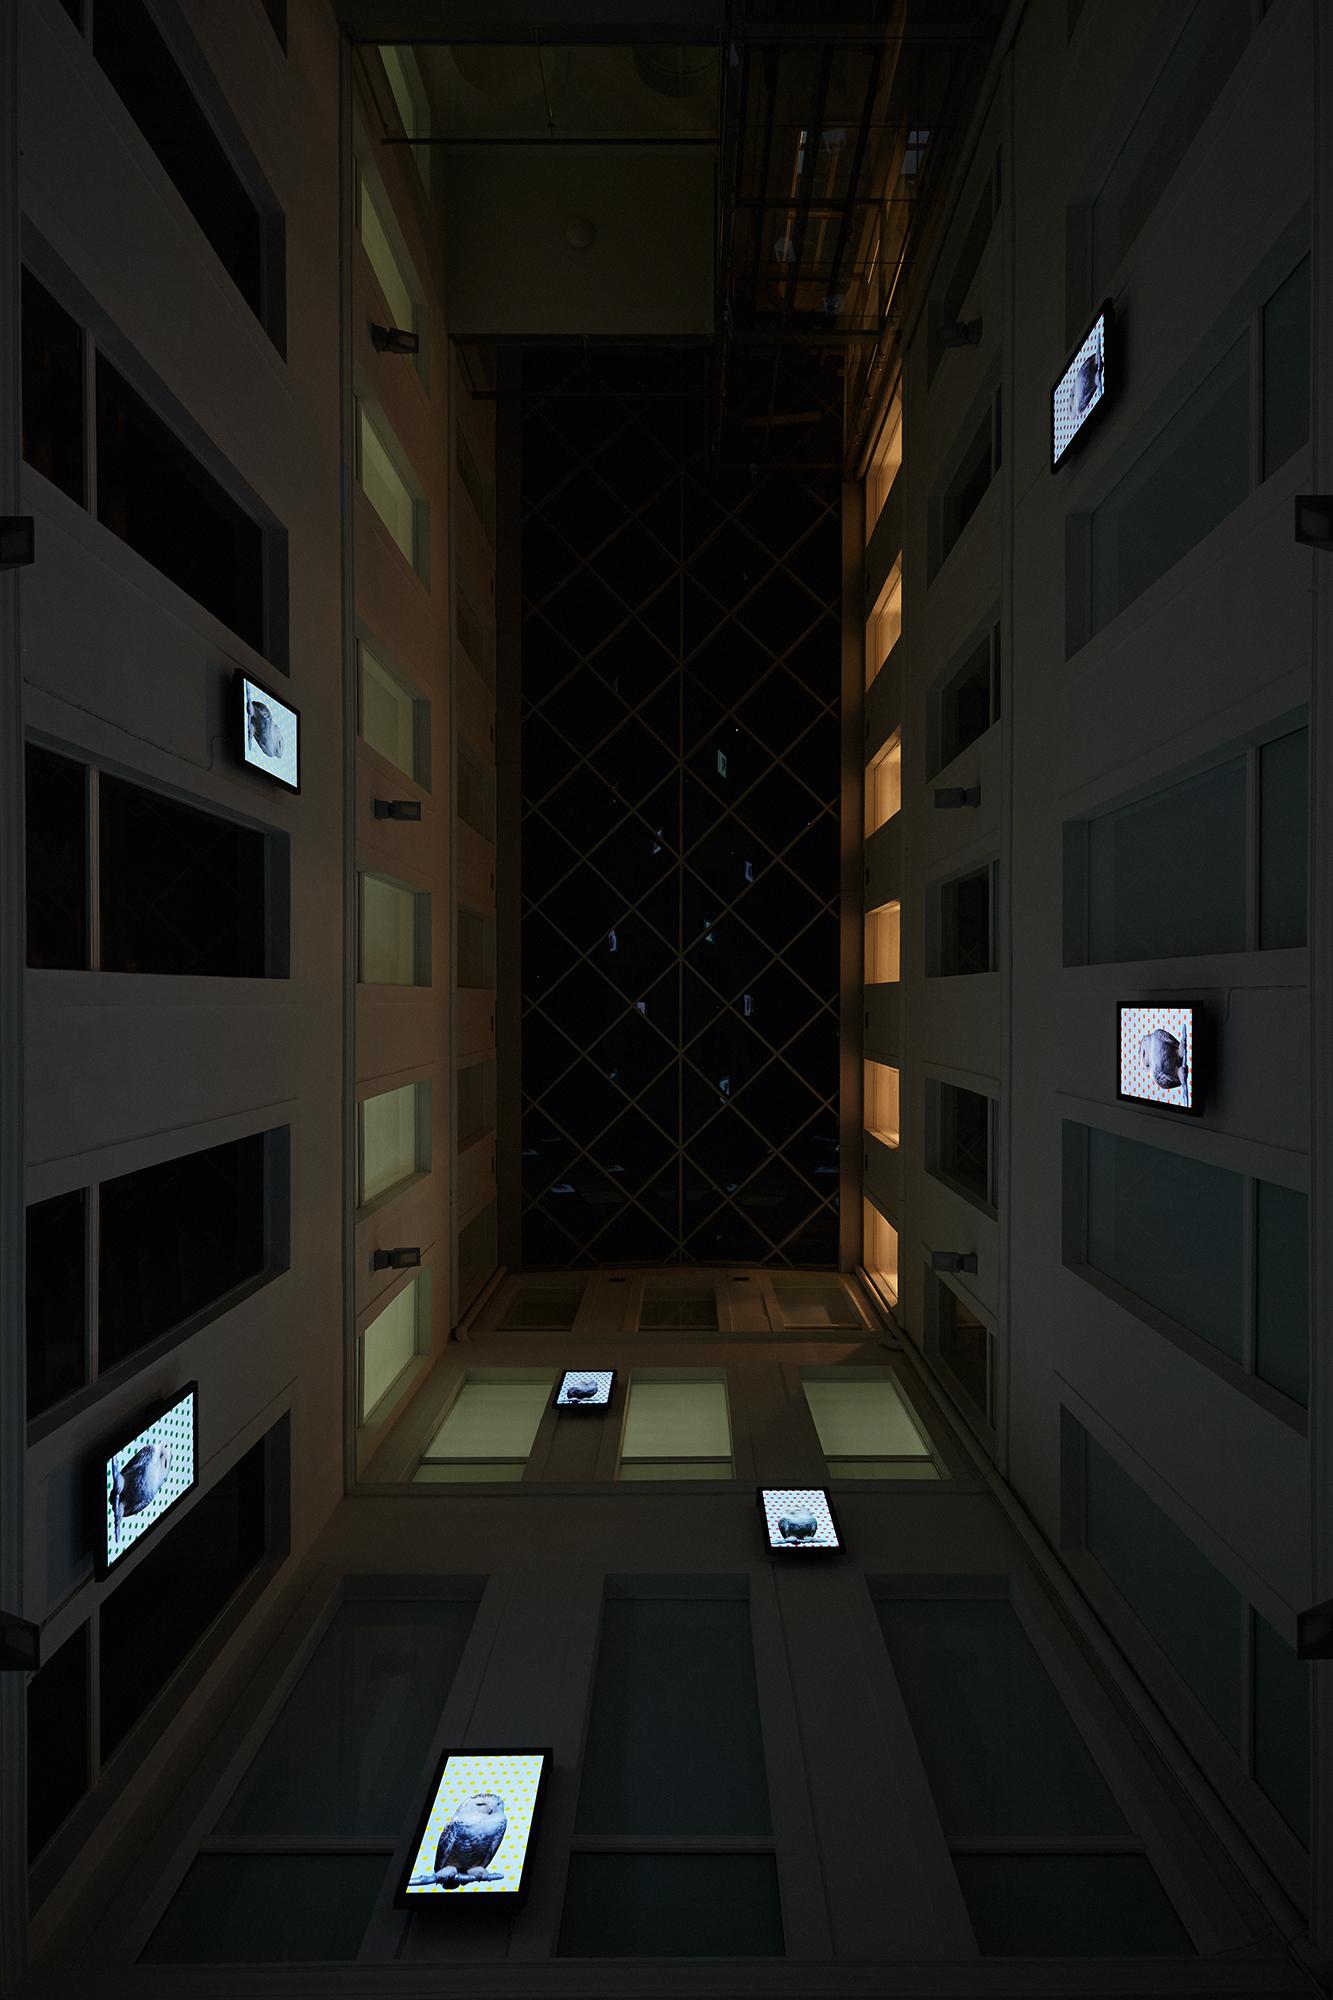 Robert_Willson_exhibition_10.jpg